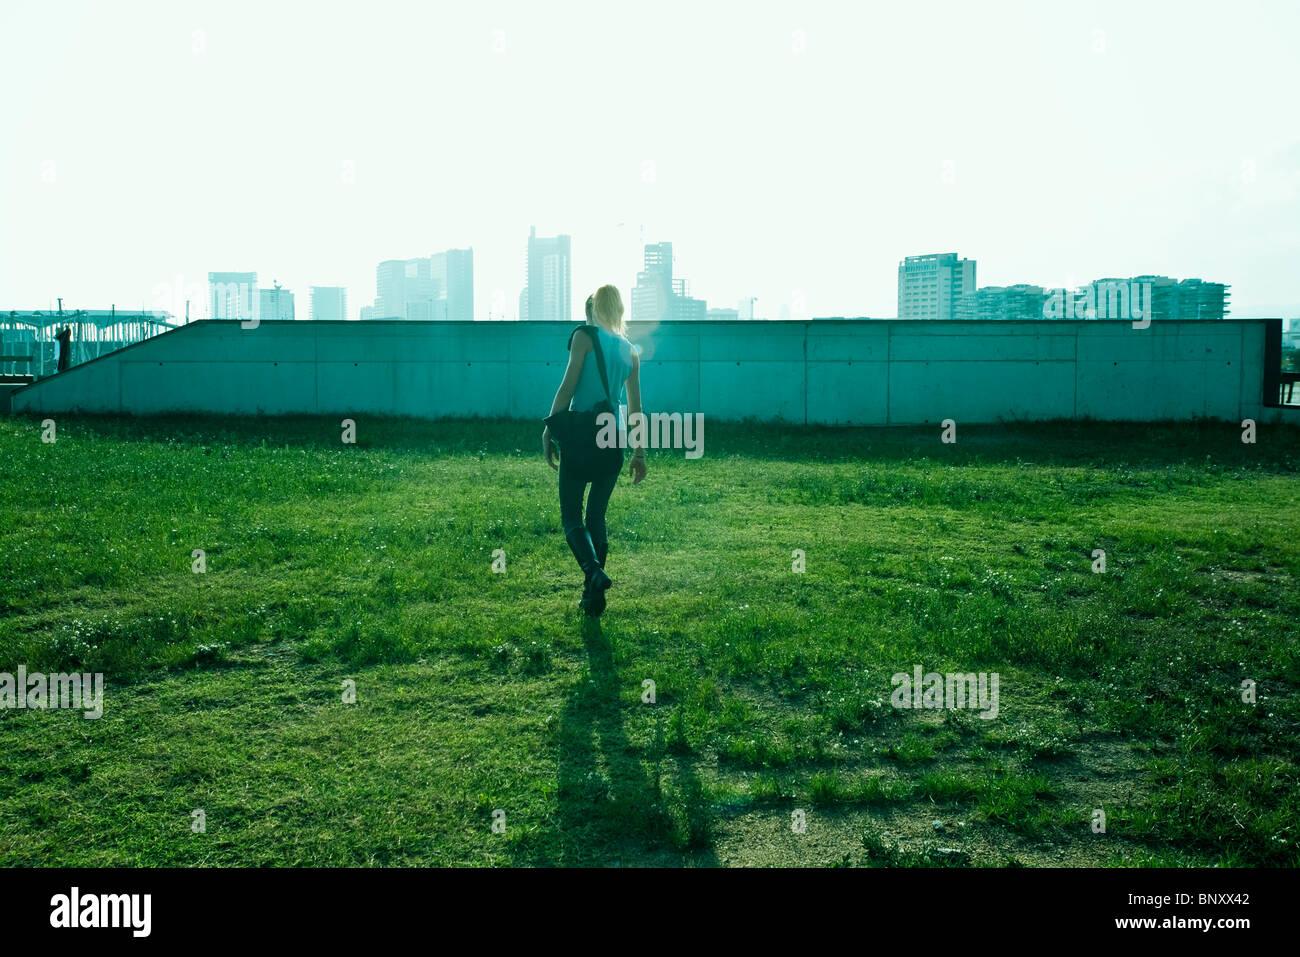 Teen girl walking across grass, urban skyline in background - Stock Image